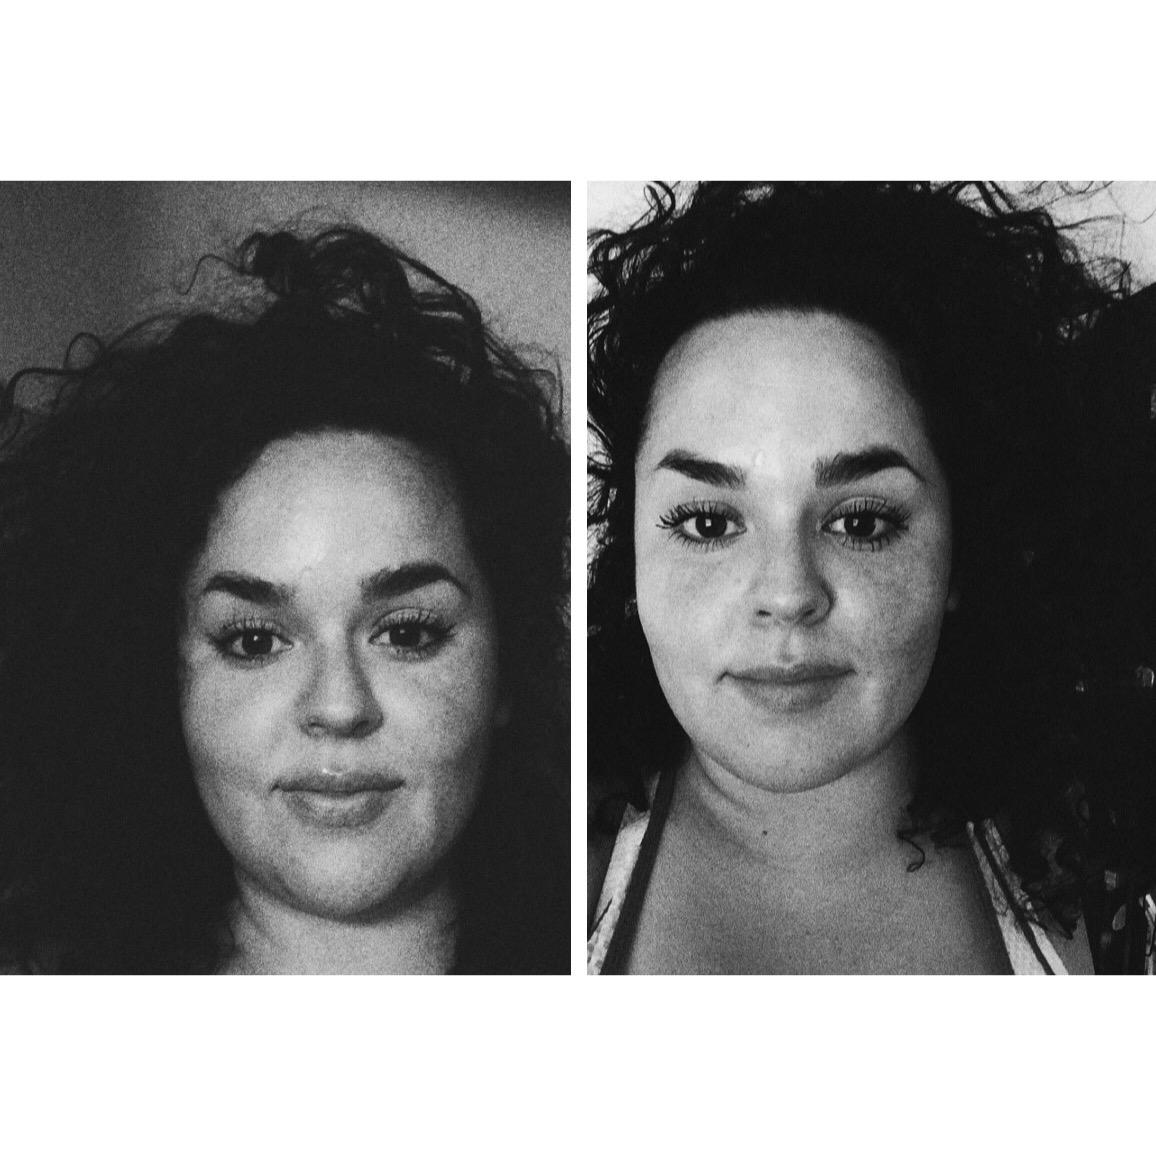 Night + Day #selfies The same,but hair-flip!